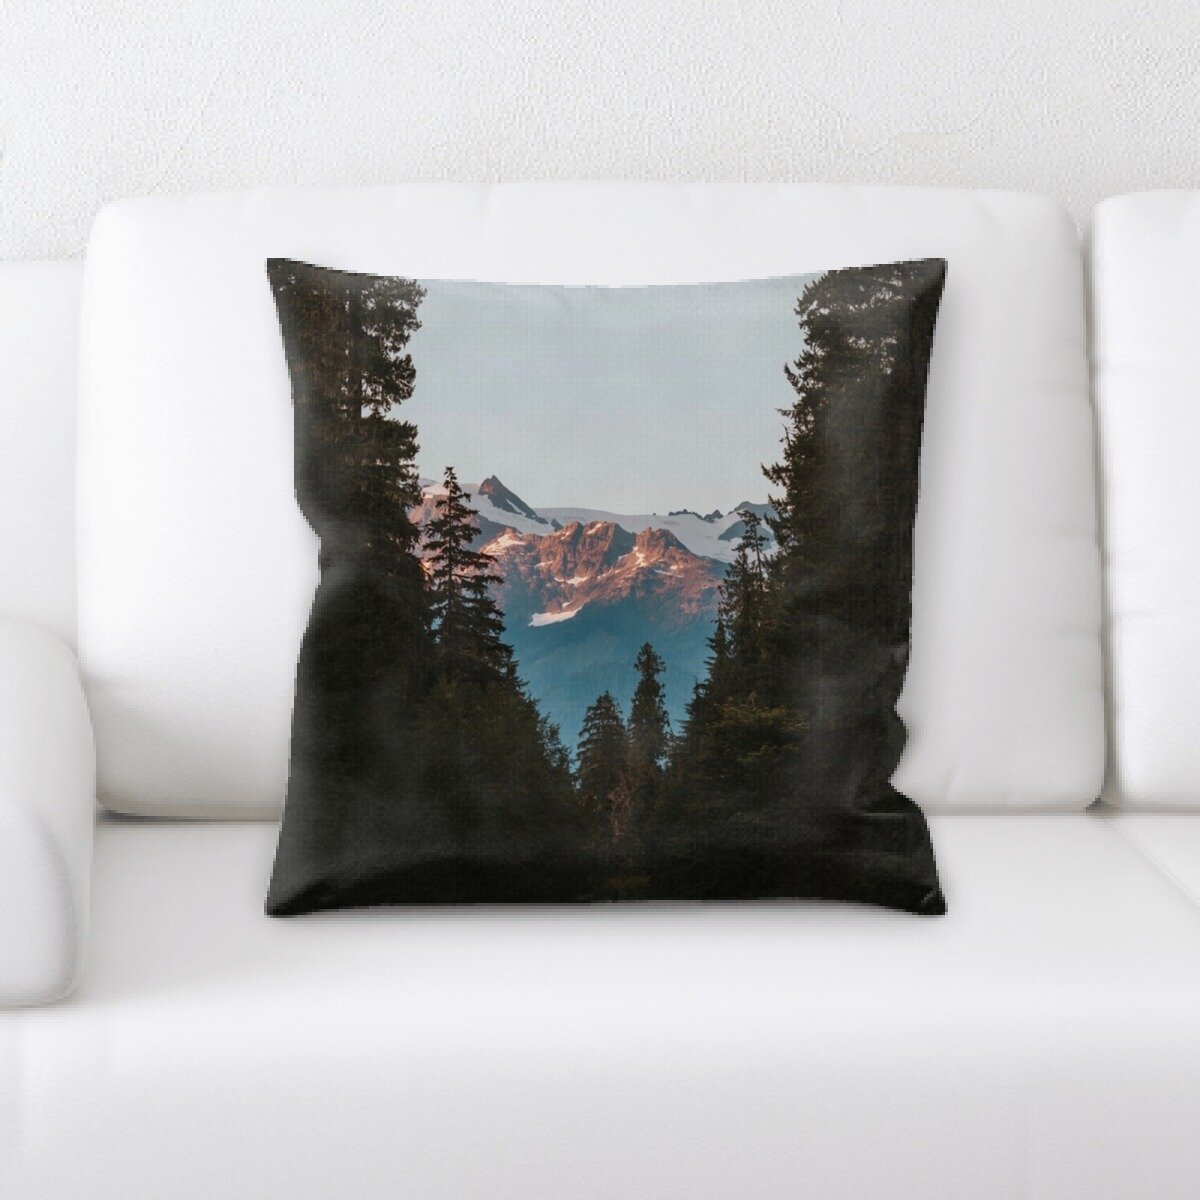 Ebern Designs Landis Throw Pillow